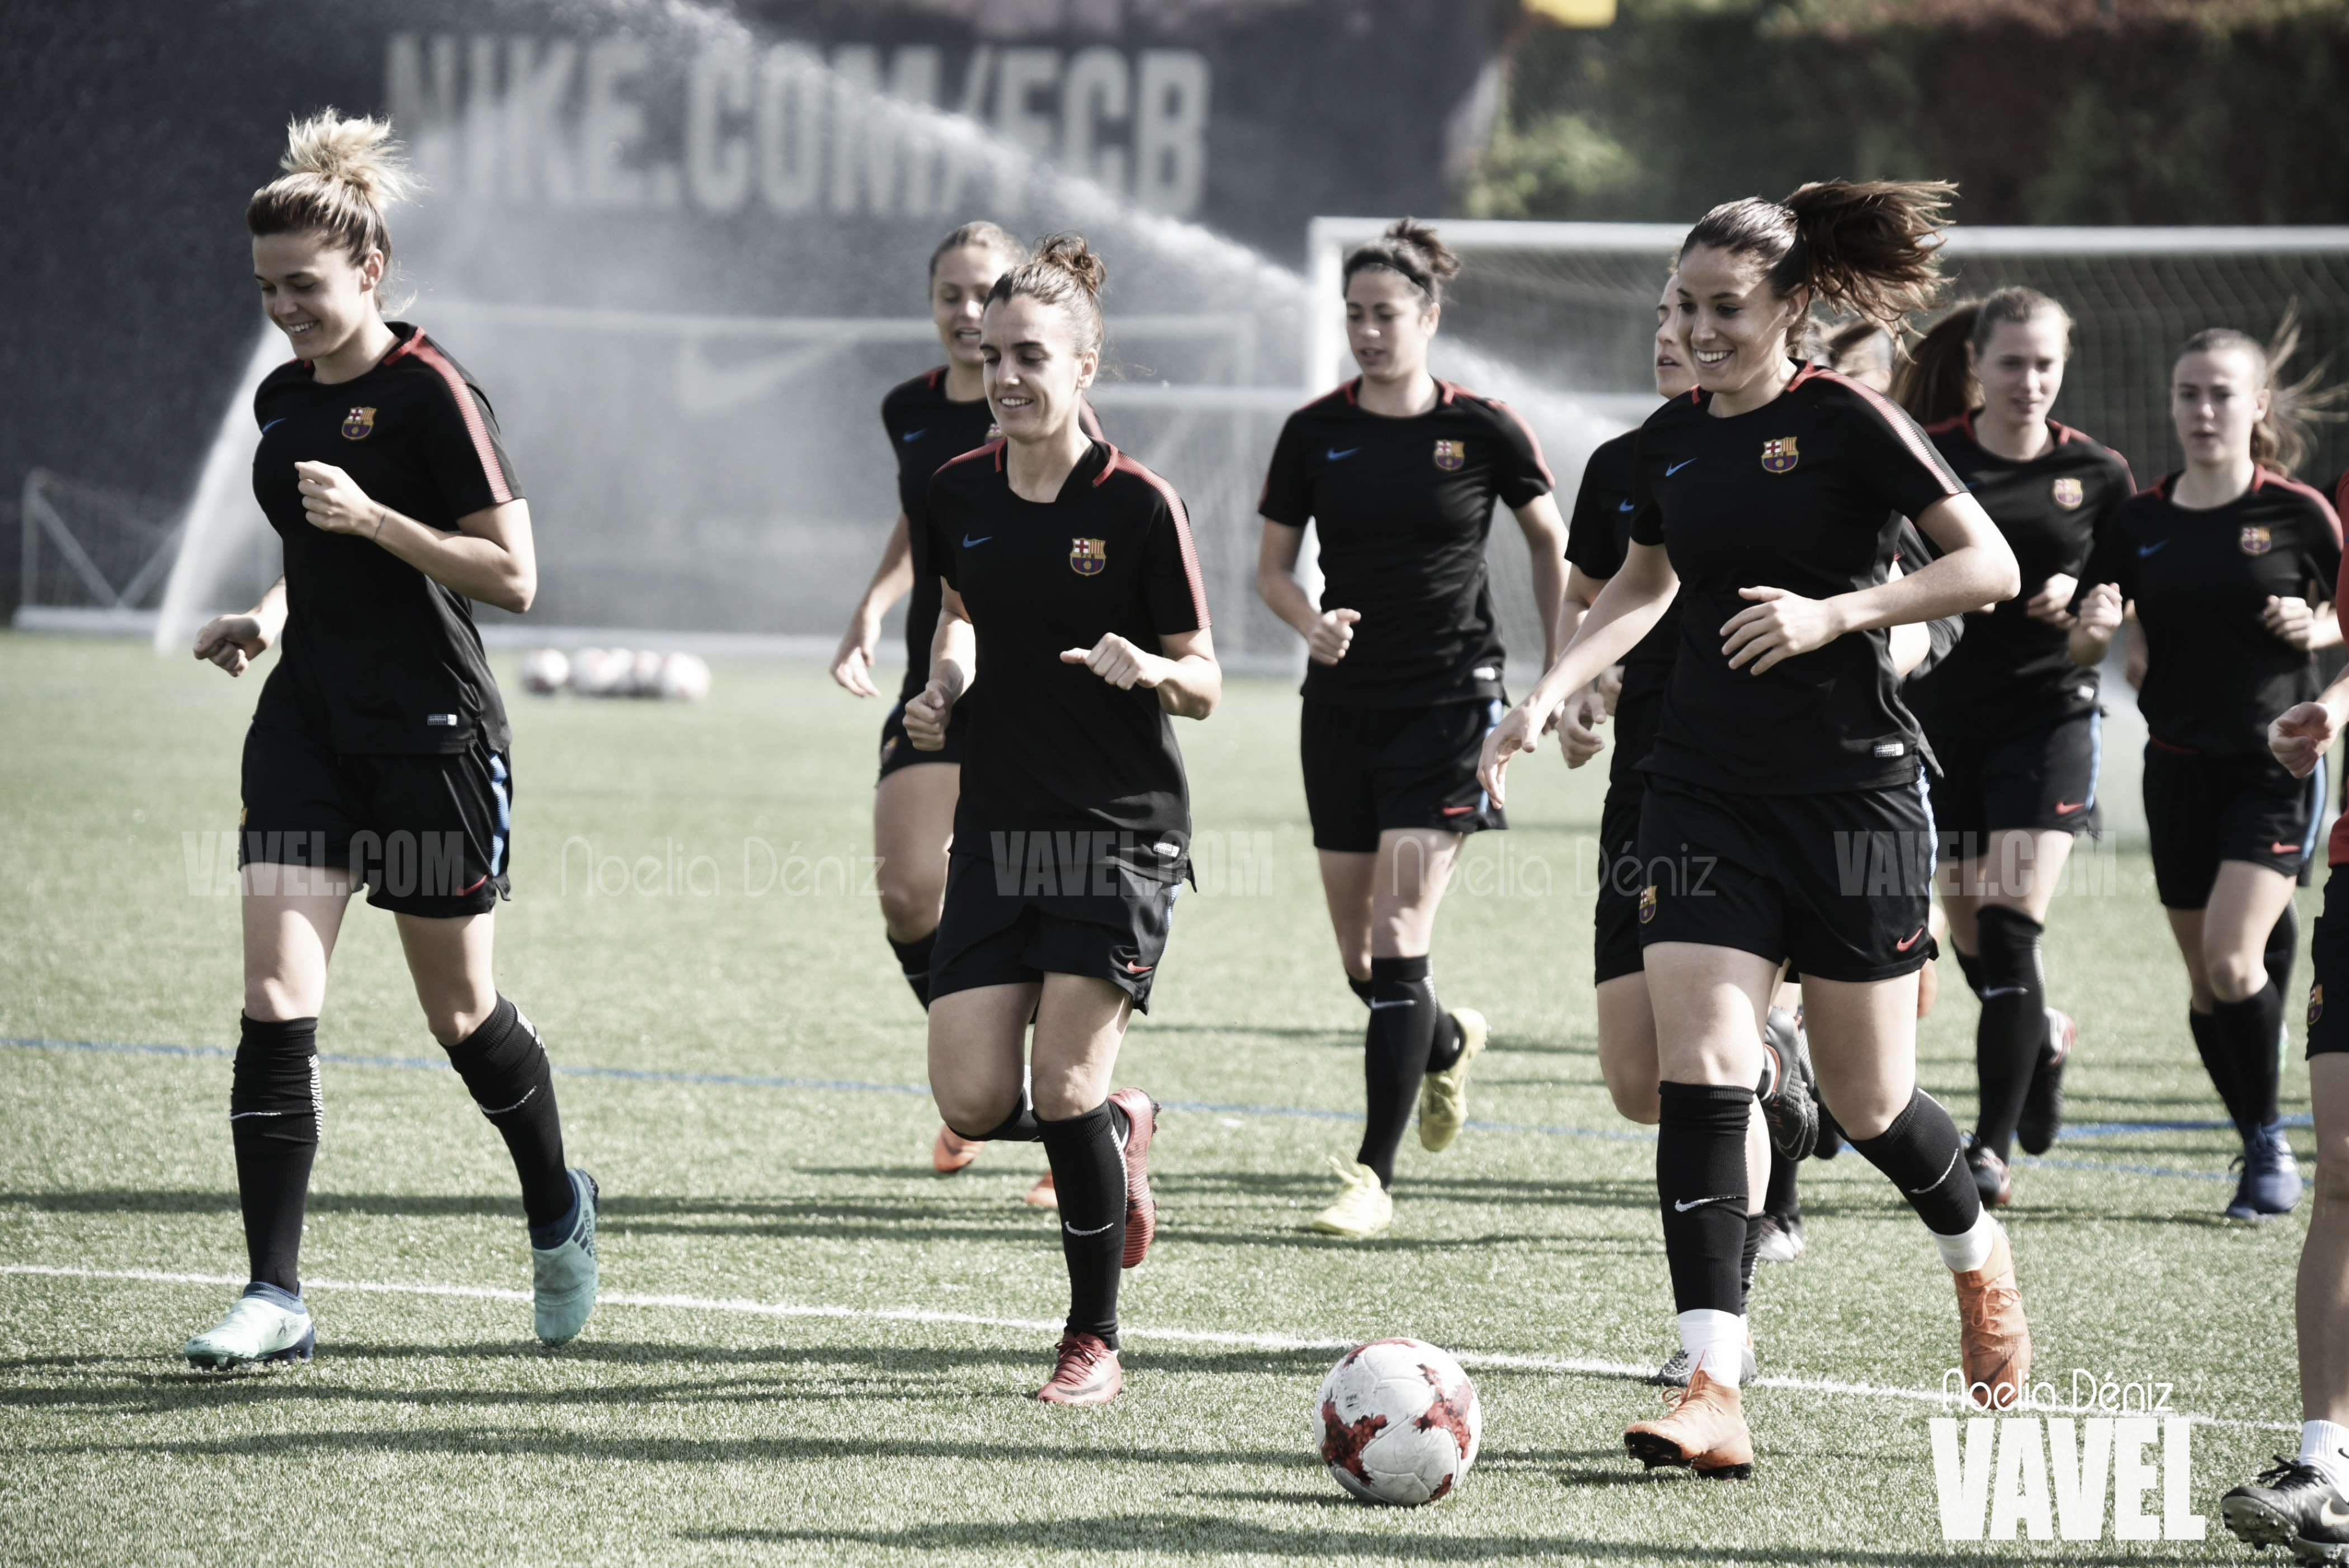 Barça Féminas: último entreno antes de viajar a Kazakhstan